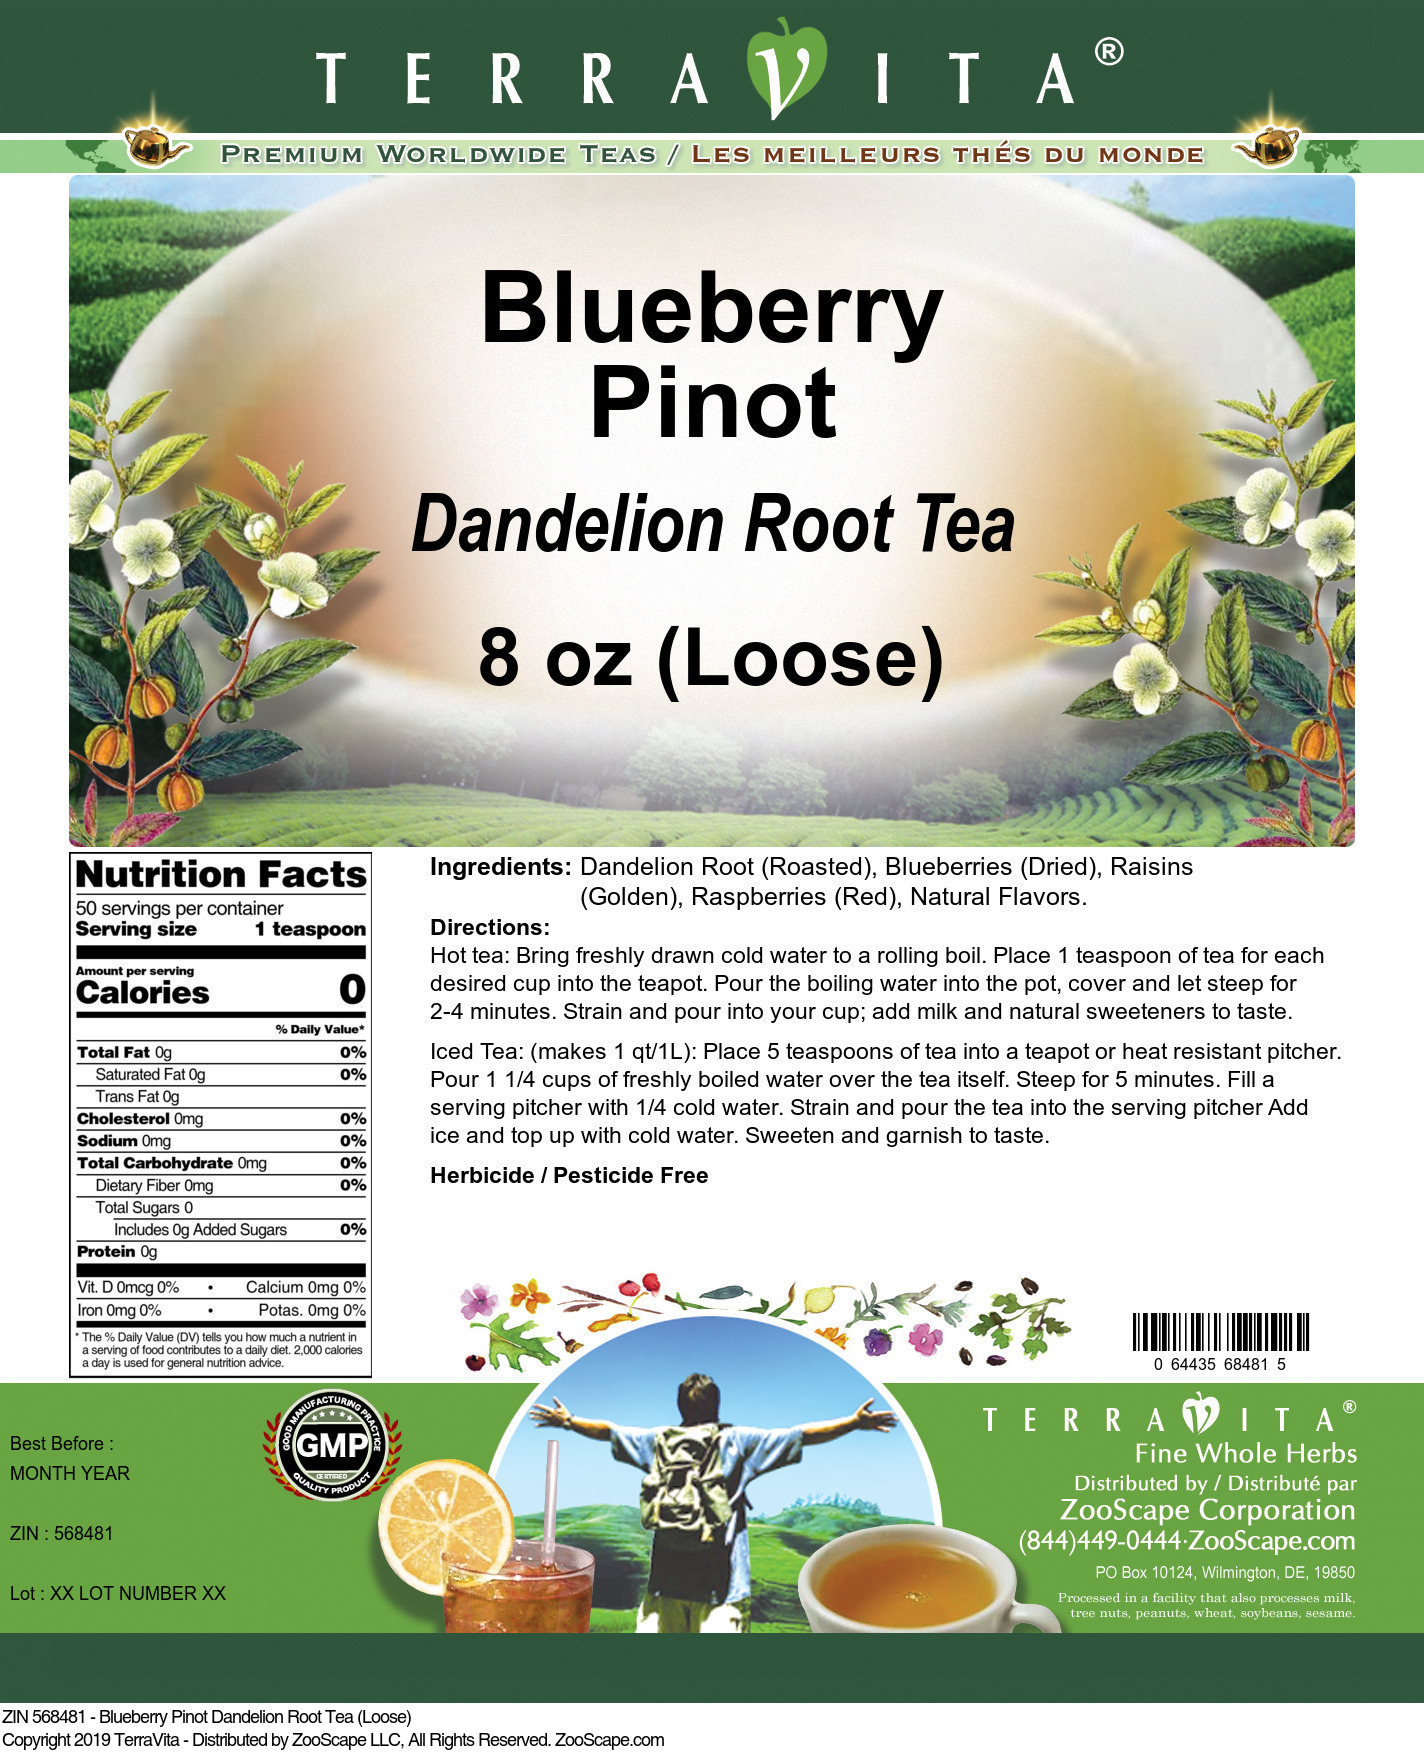 Blueberry Pinot Dandelion Root